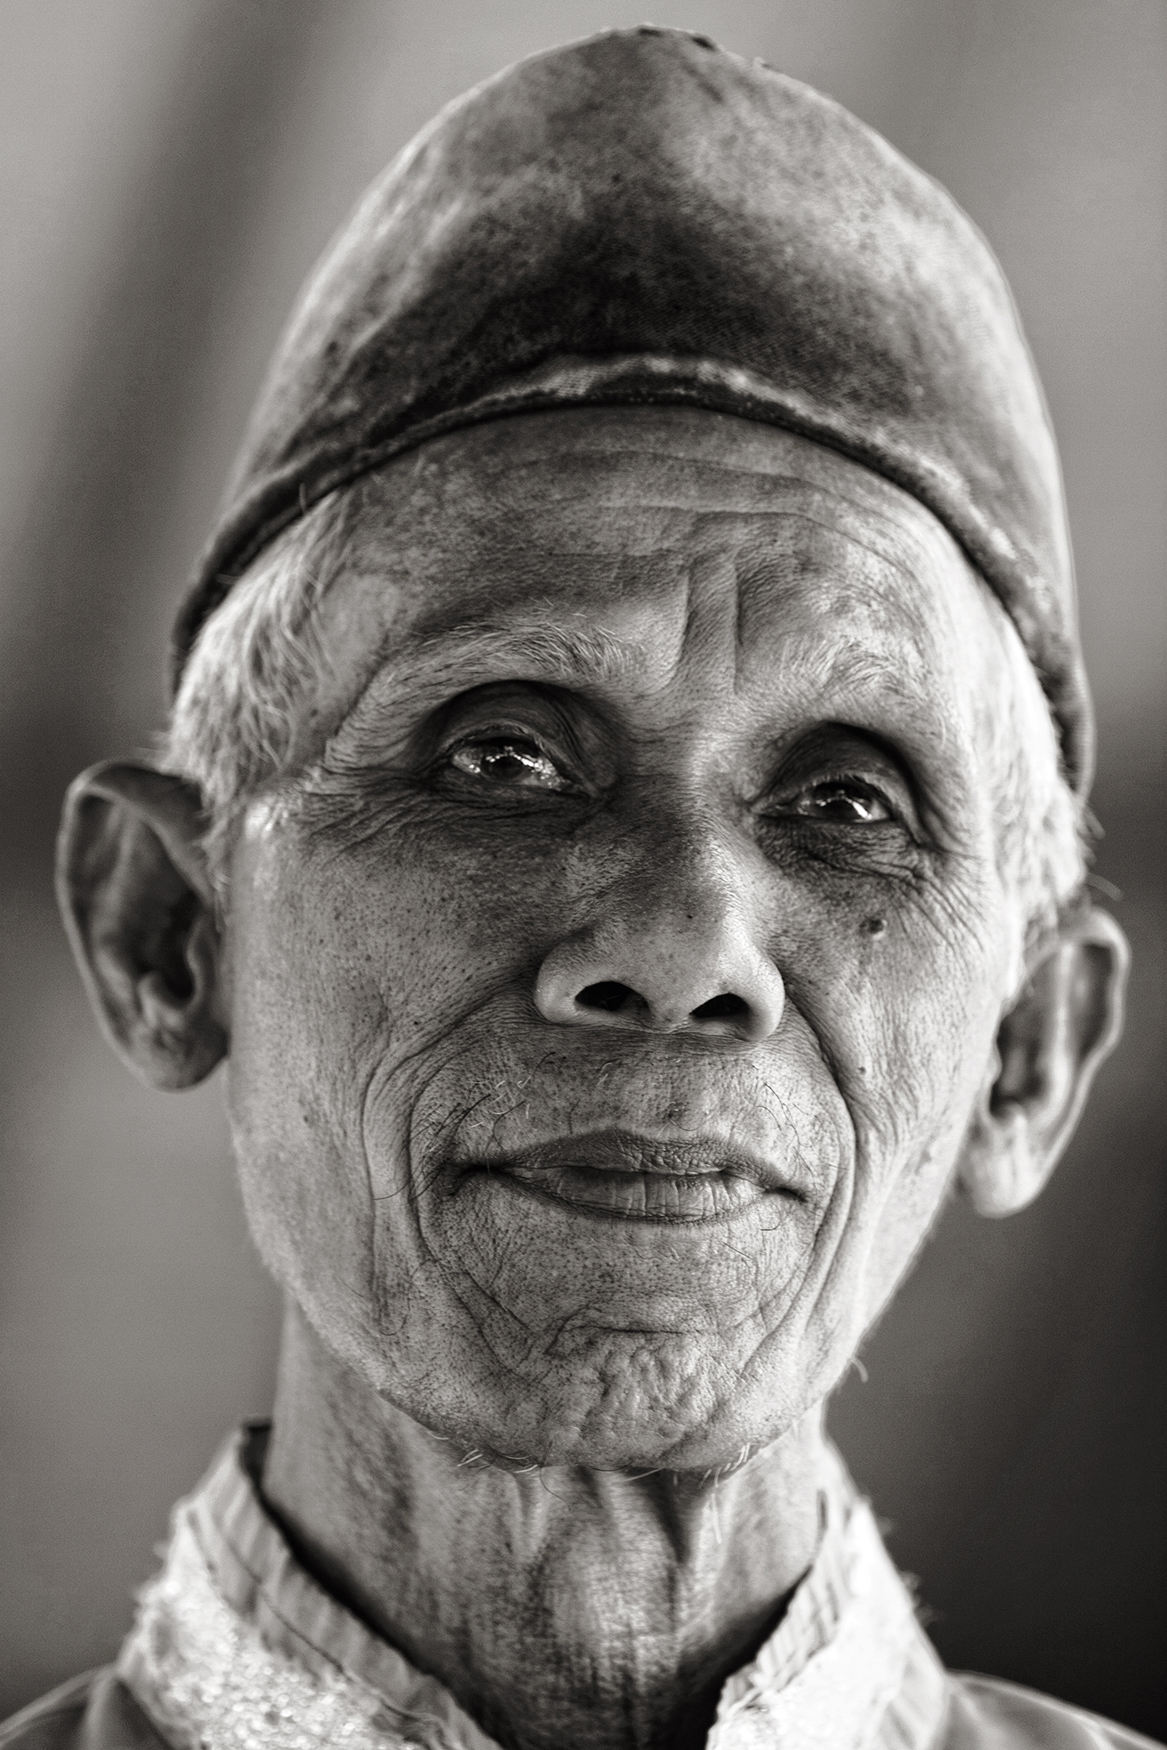 Indonesian Visage 21